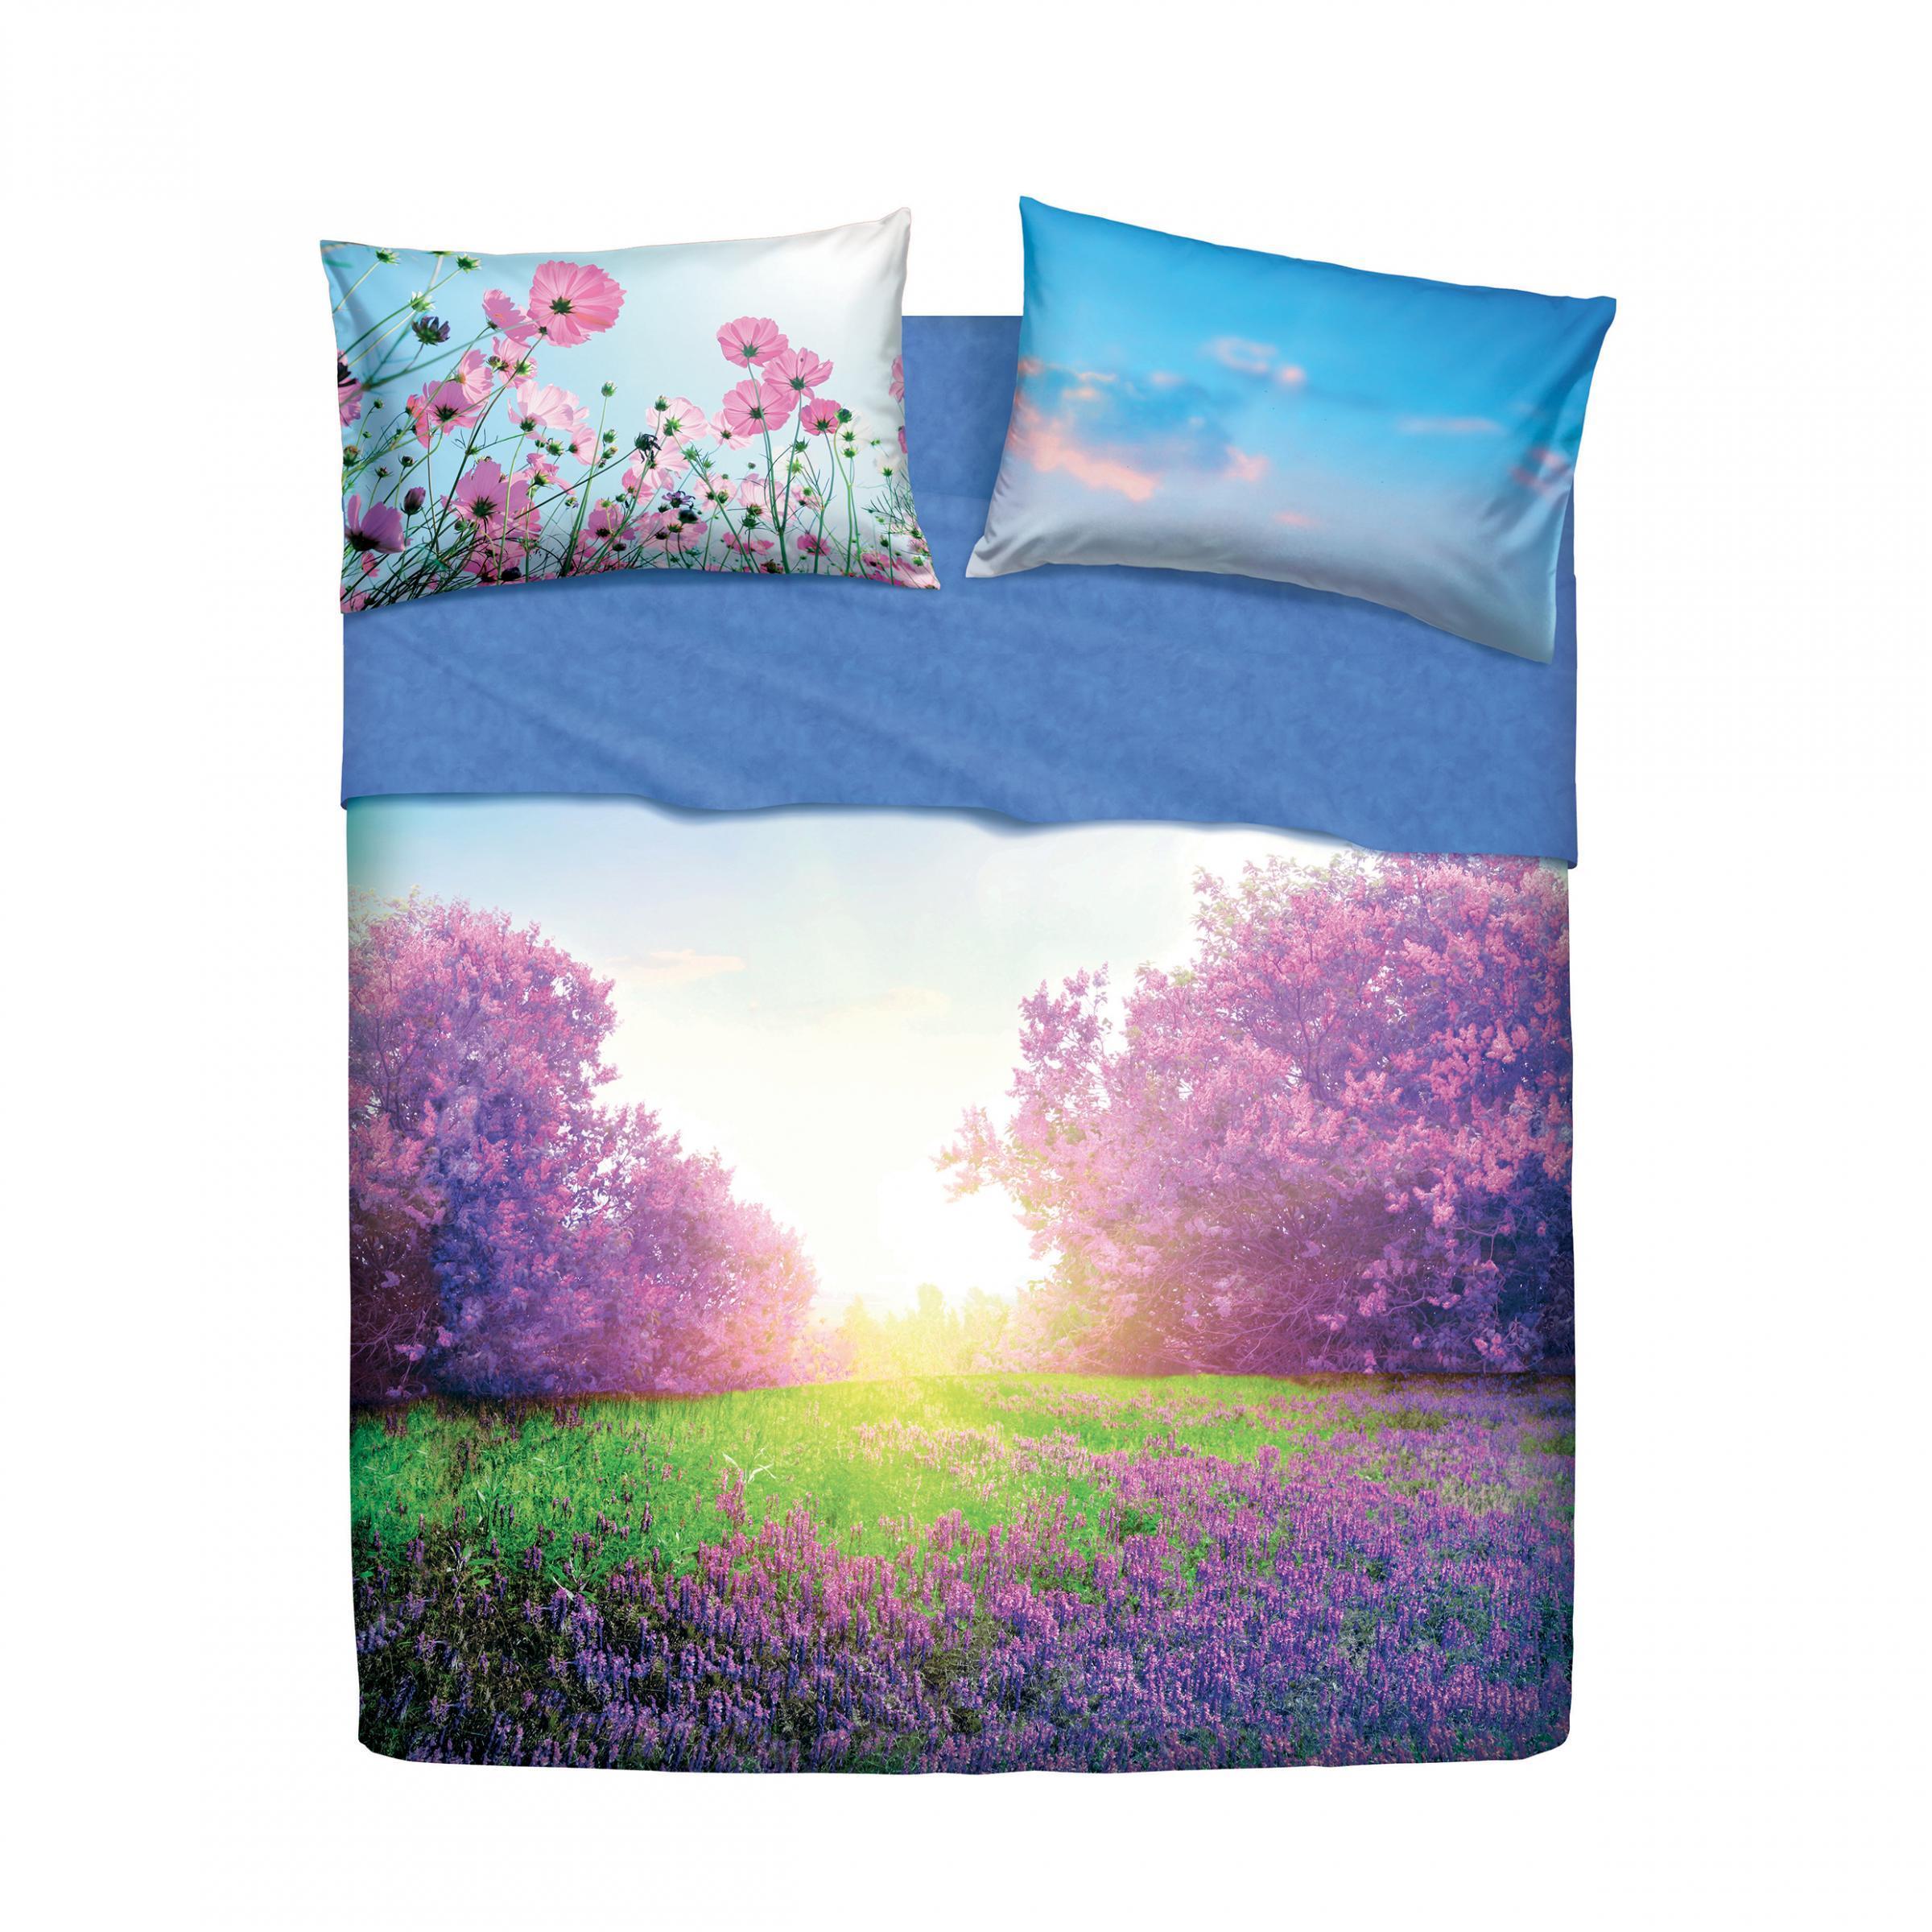 96490fff07 Set lenzuola letto singolo 1 piazza BASSETTI PURPLE SUMMER stampa digitale